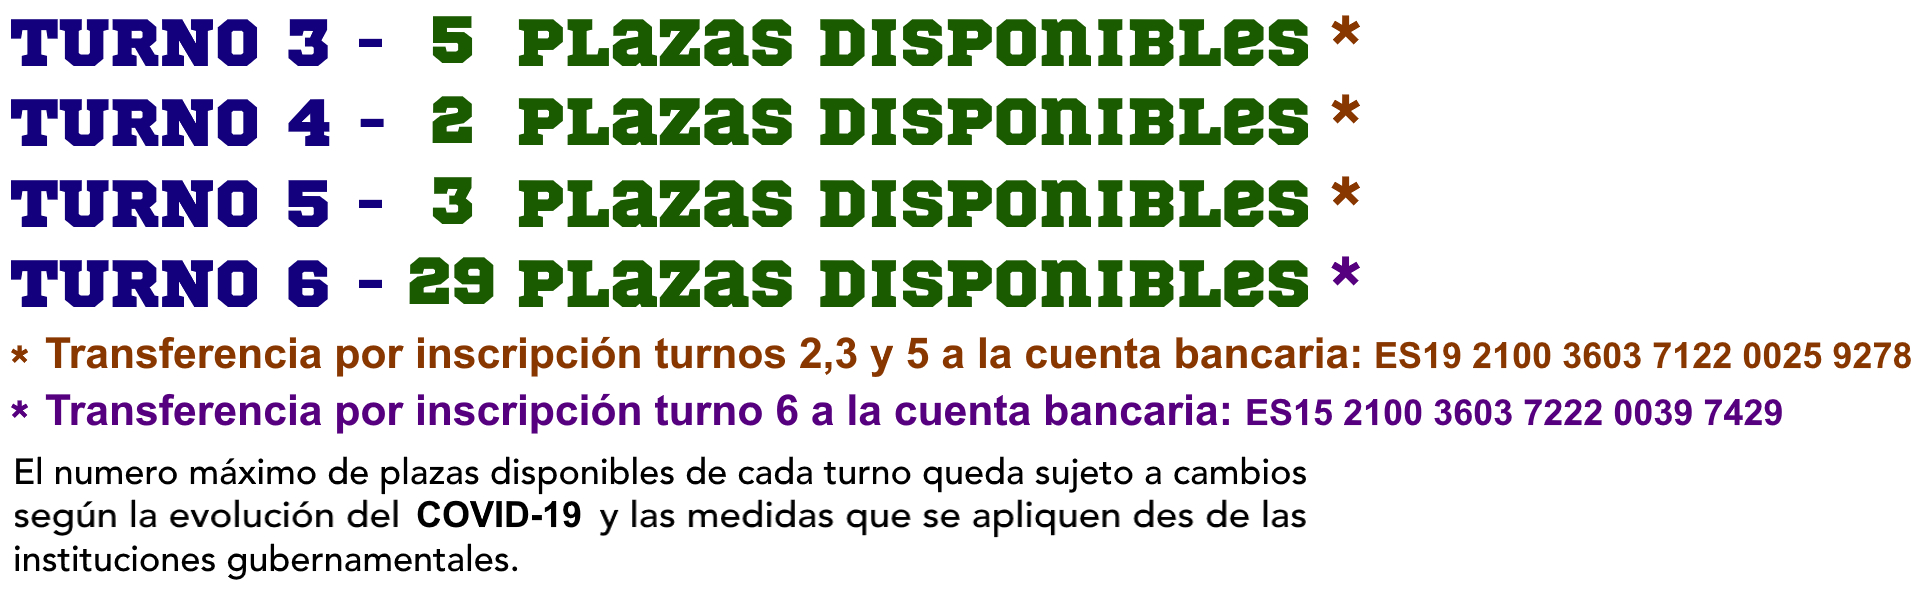 DISPO_TURNOS_CAS